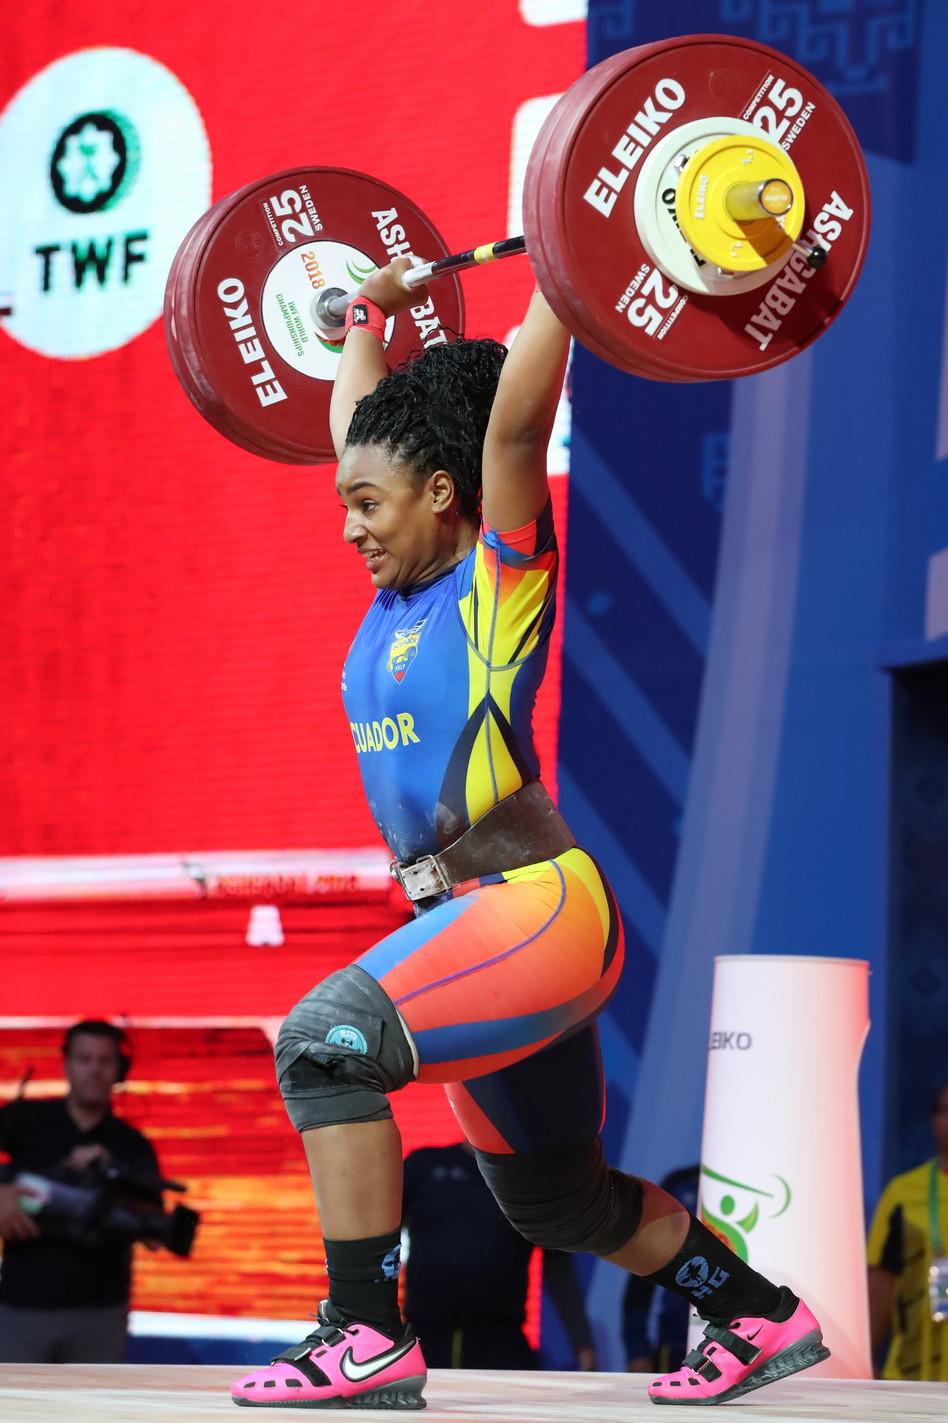 Ecuadorian Tamara Yajaira Salazar Arce stood on the third step of the overall podium with 242kg ©IWF